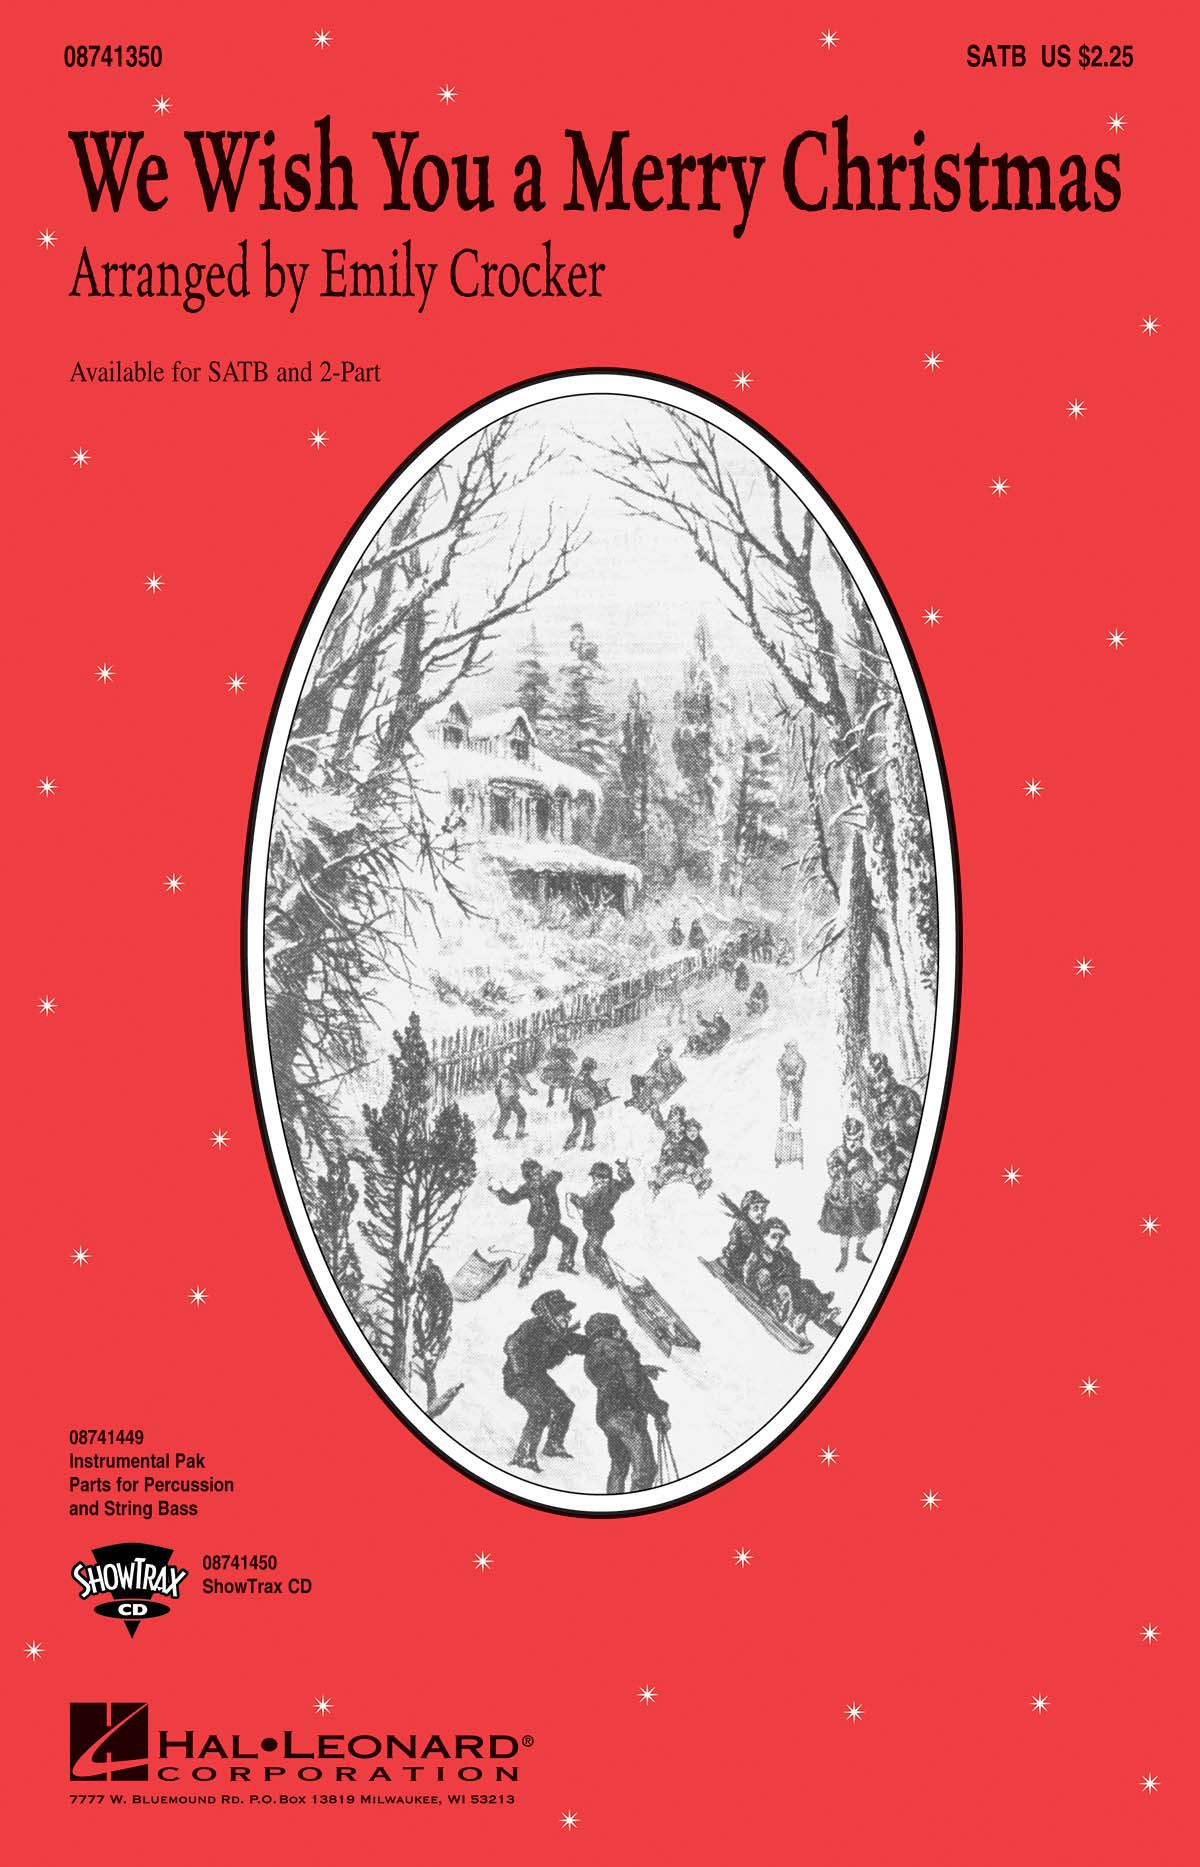 We wish you a merry Christmas: SATB: Vocal Score